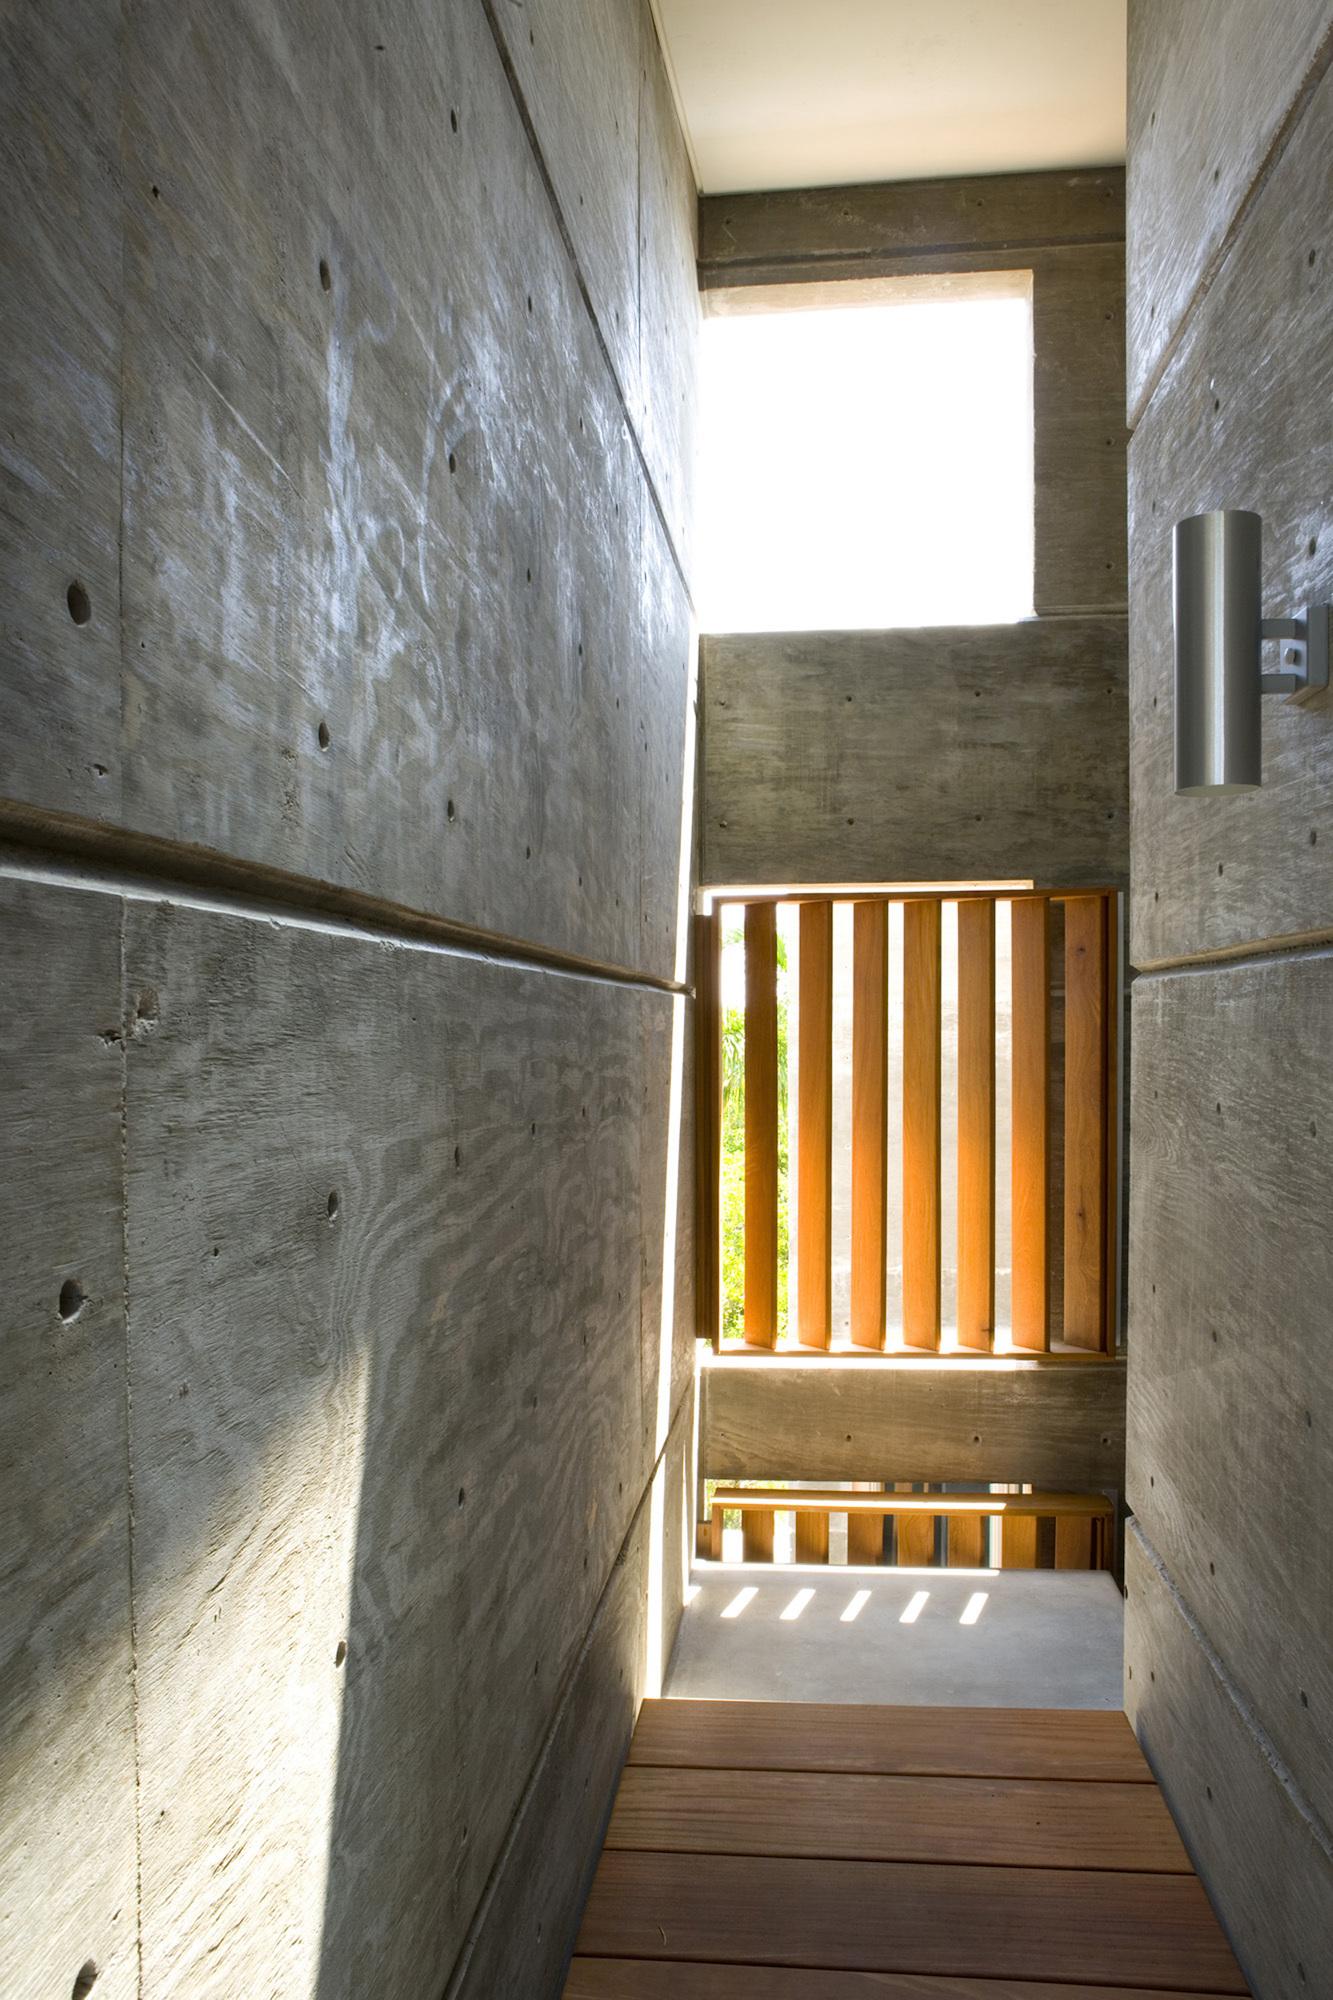 residencia-tavernier-drive-luis-pons-design-lab_eric_carle_060407_054